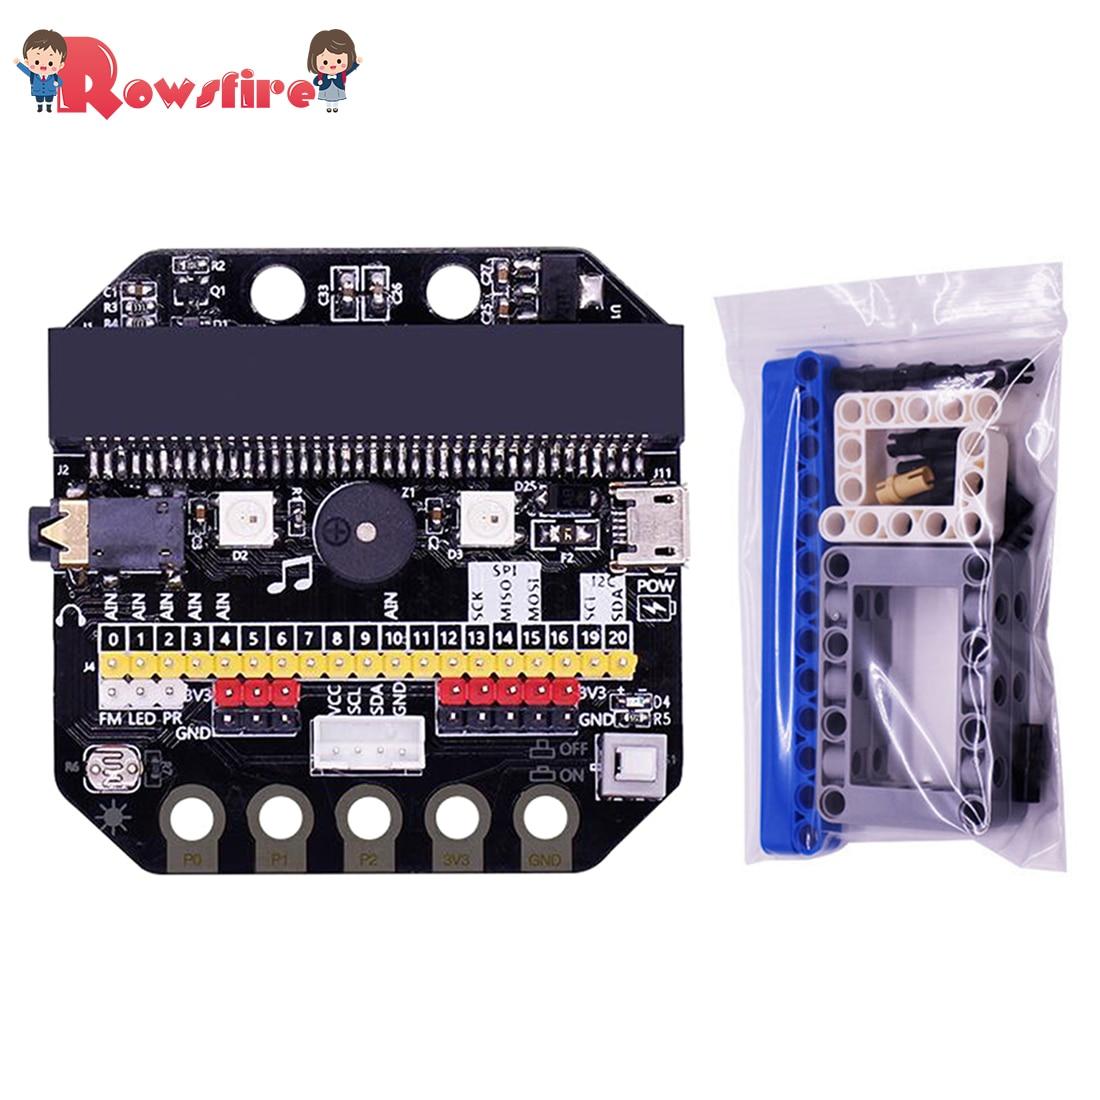 Basic:Bit IO Expansion Board Horizontal Type Pinboard Microbit Python Development Board